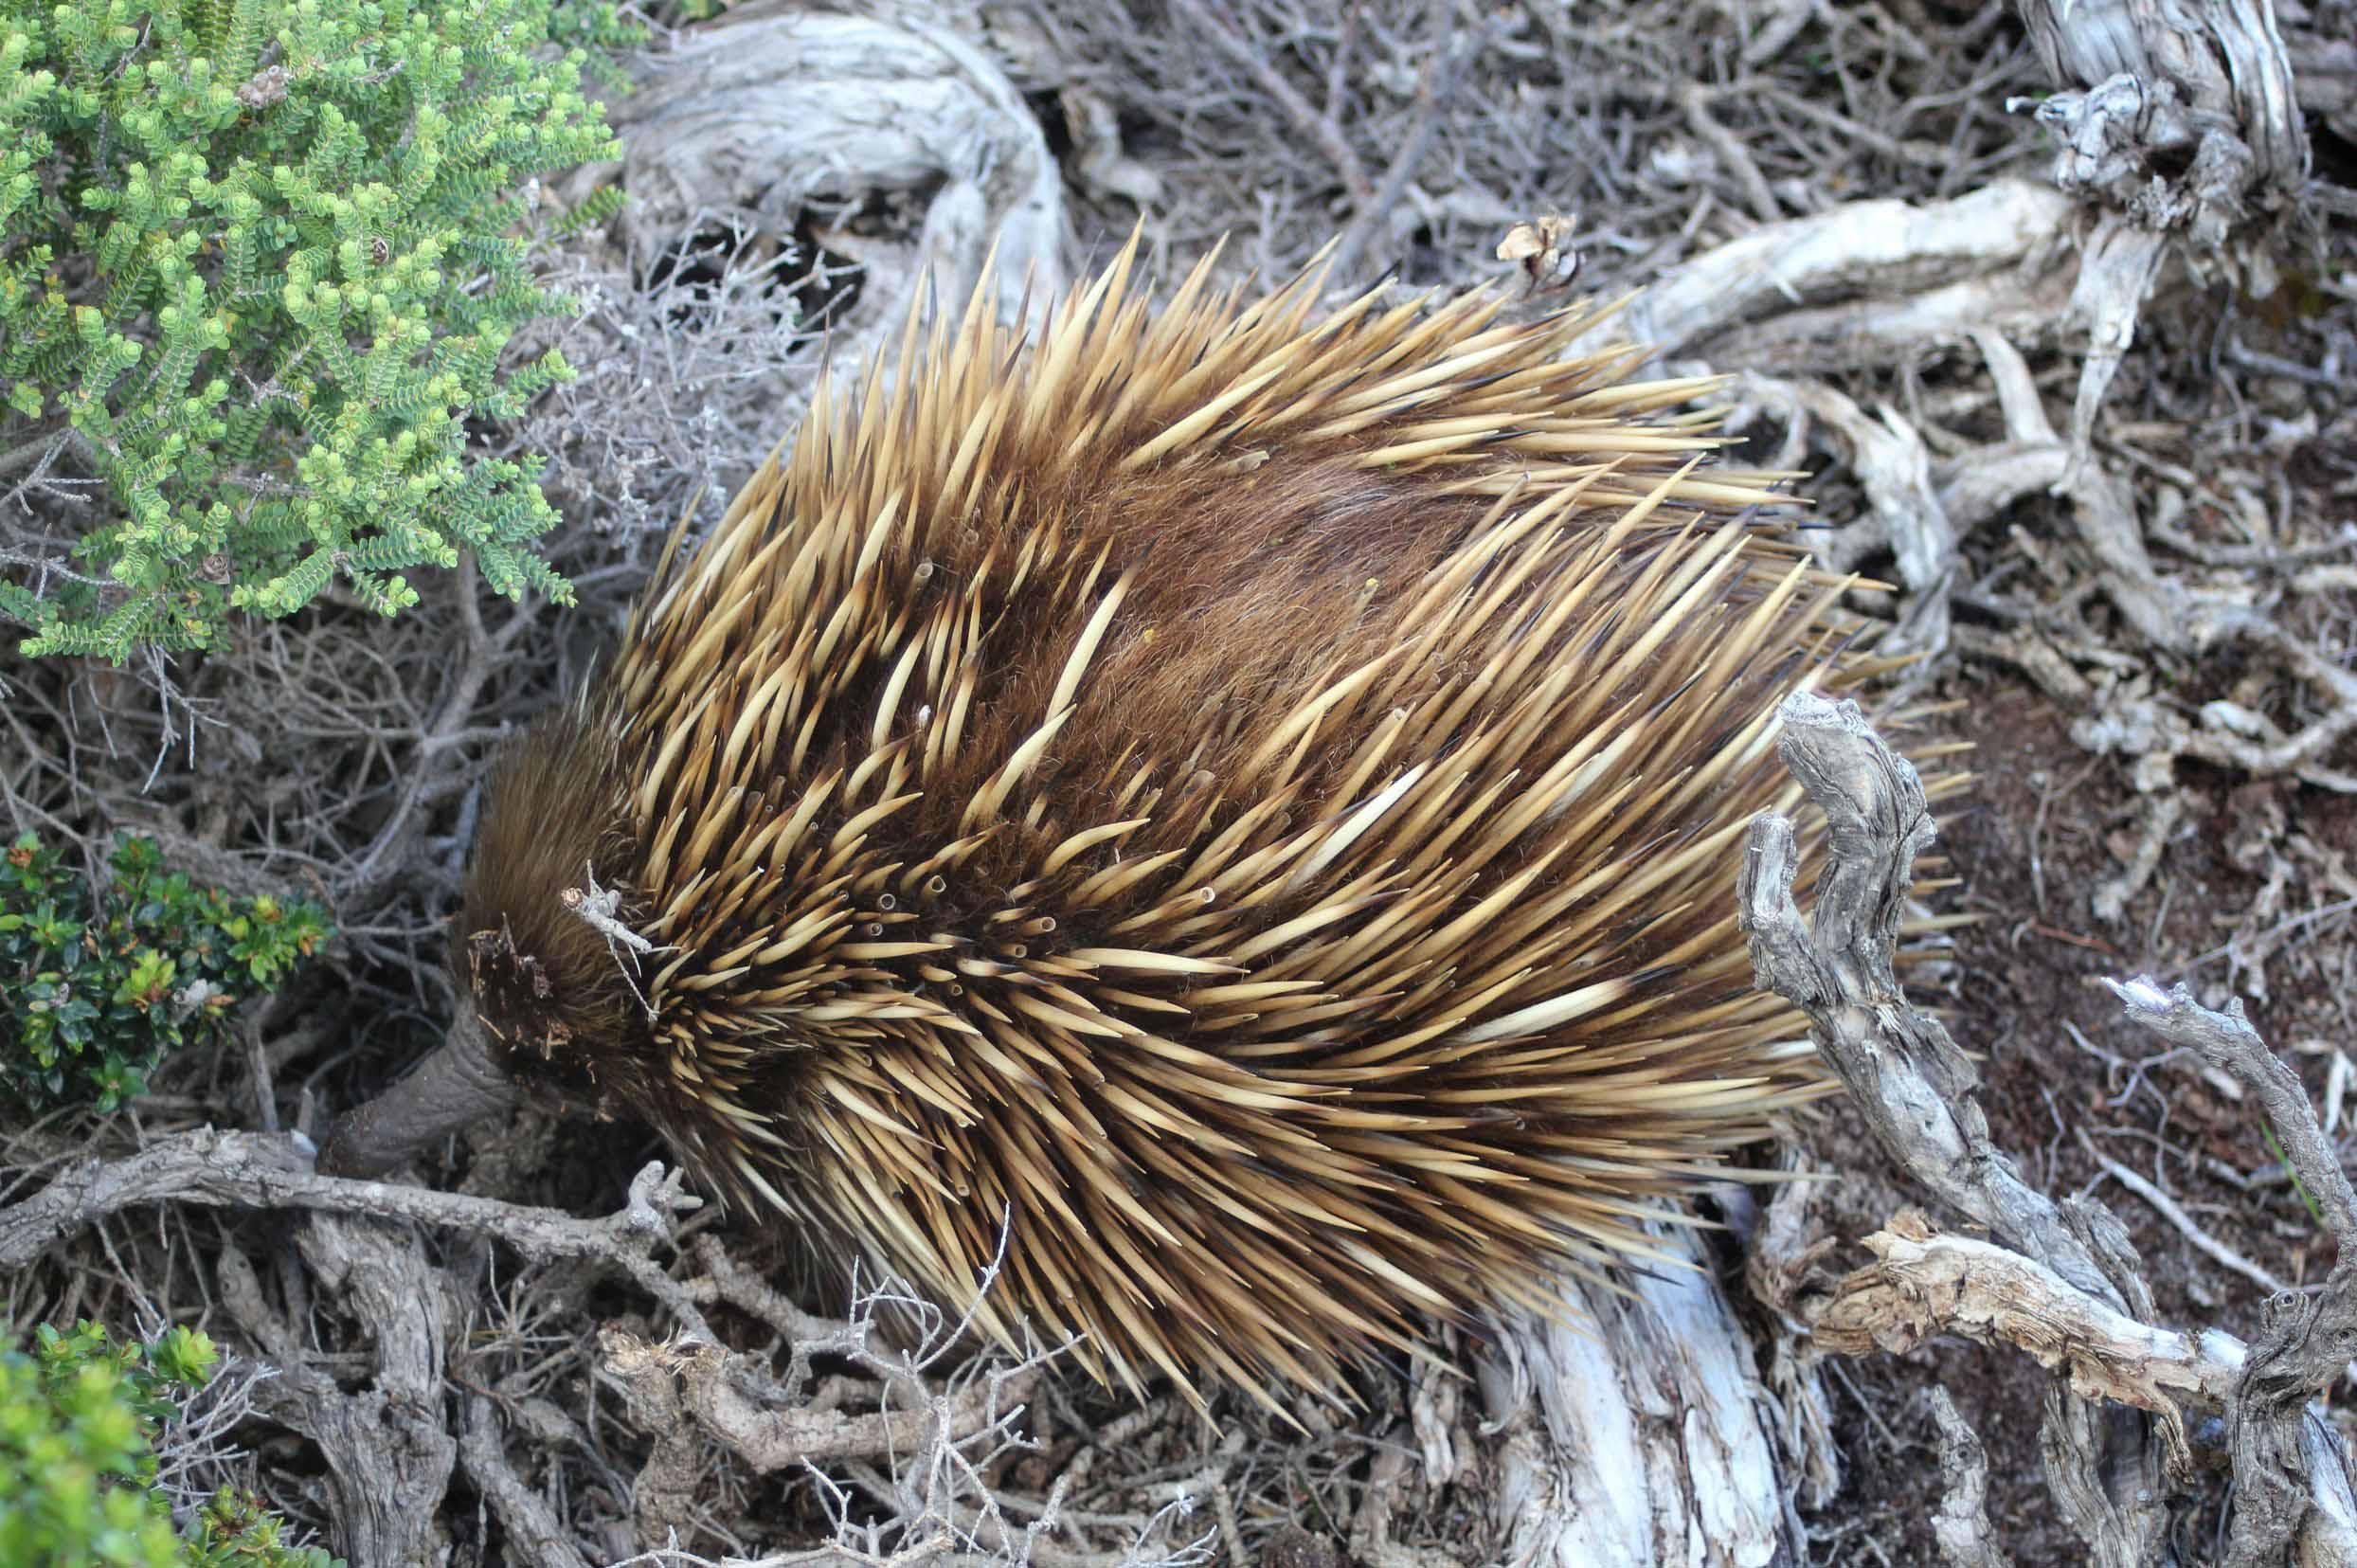 echidna-burrowing-australia